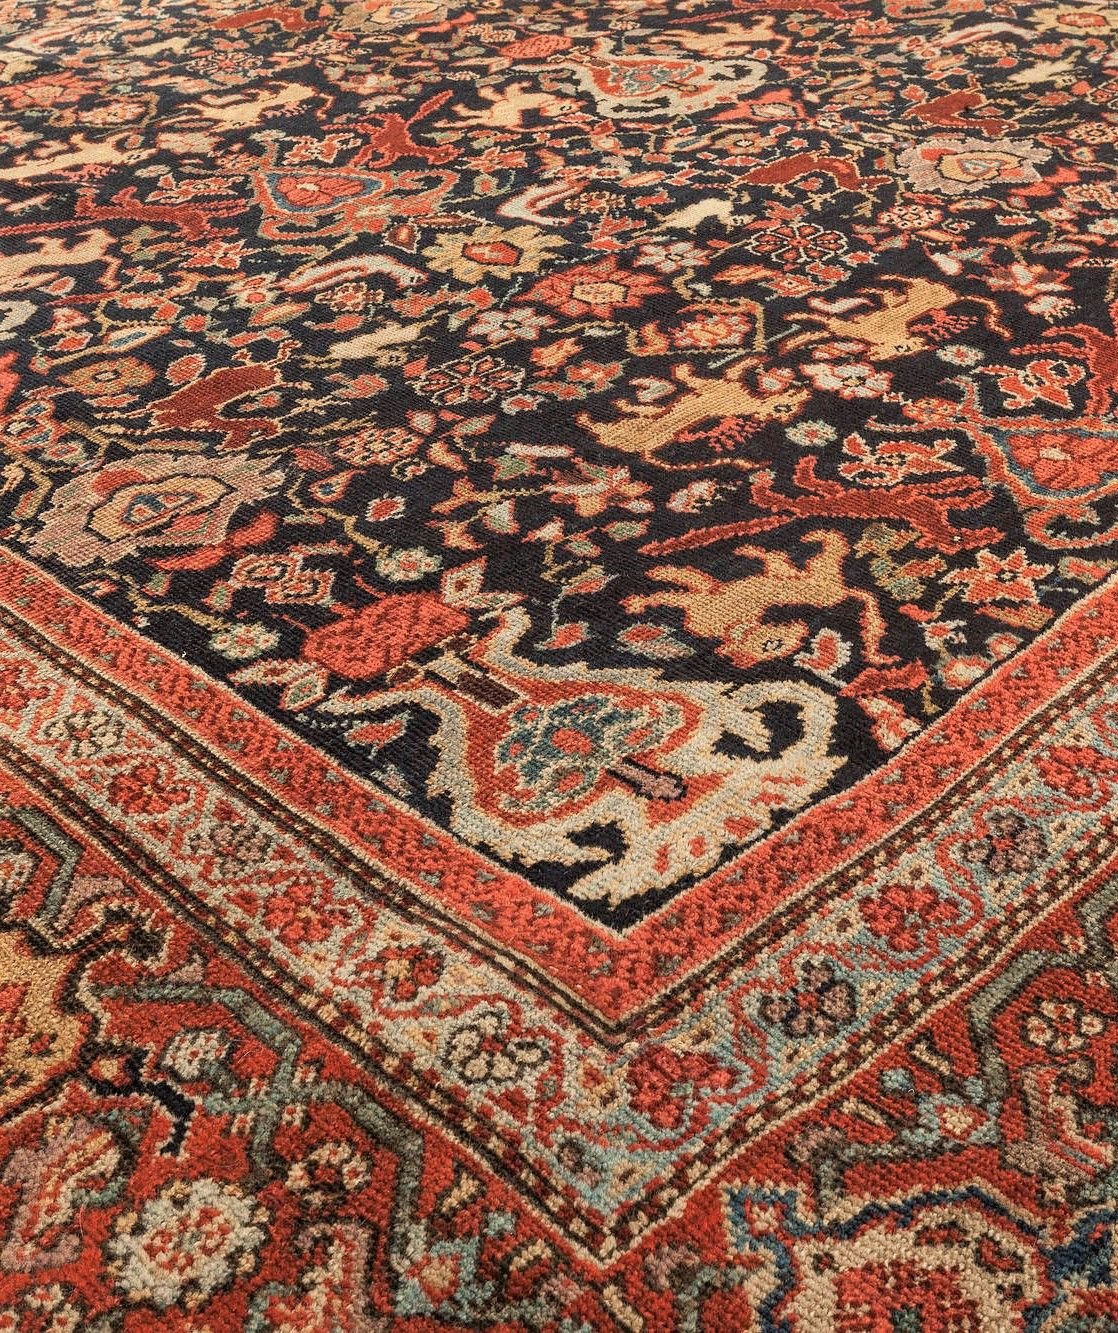 Doris Leslie Blau Most Trusted Antique Persian Rugs Dealer In New York City Simple Carpets Patterned Carpet Silver Carpet